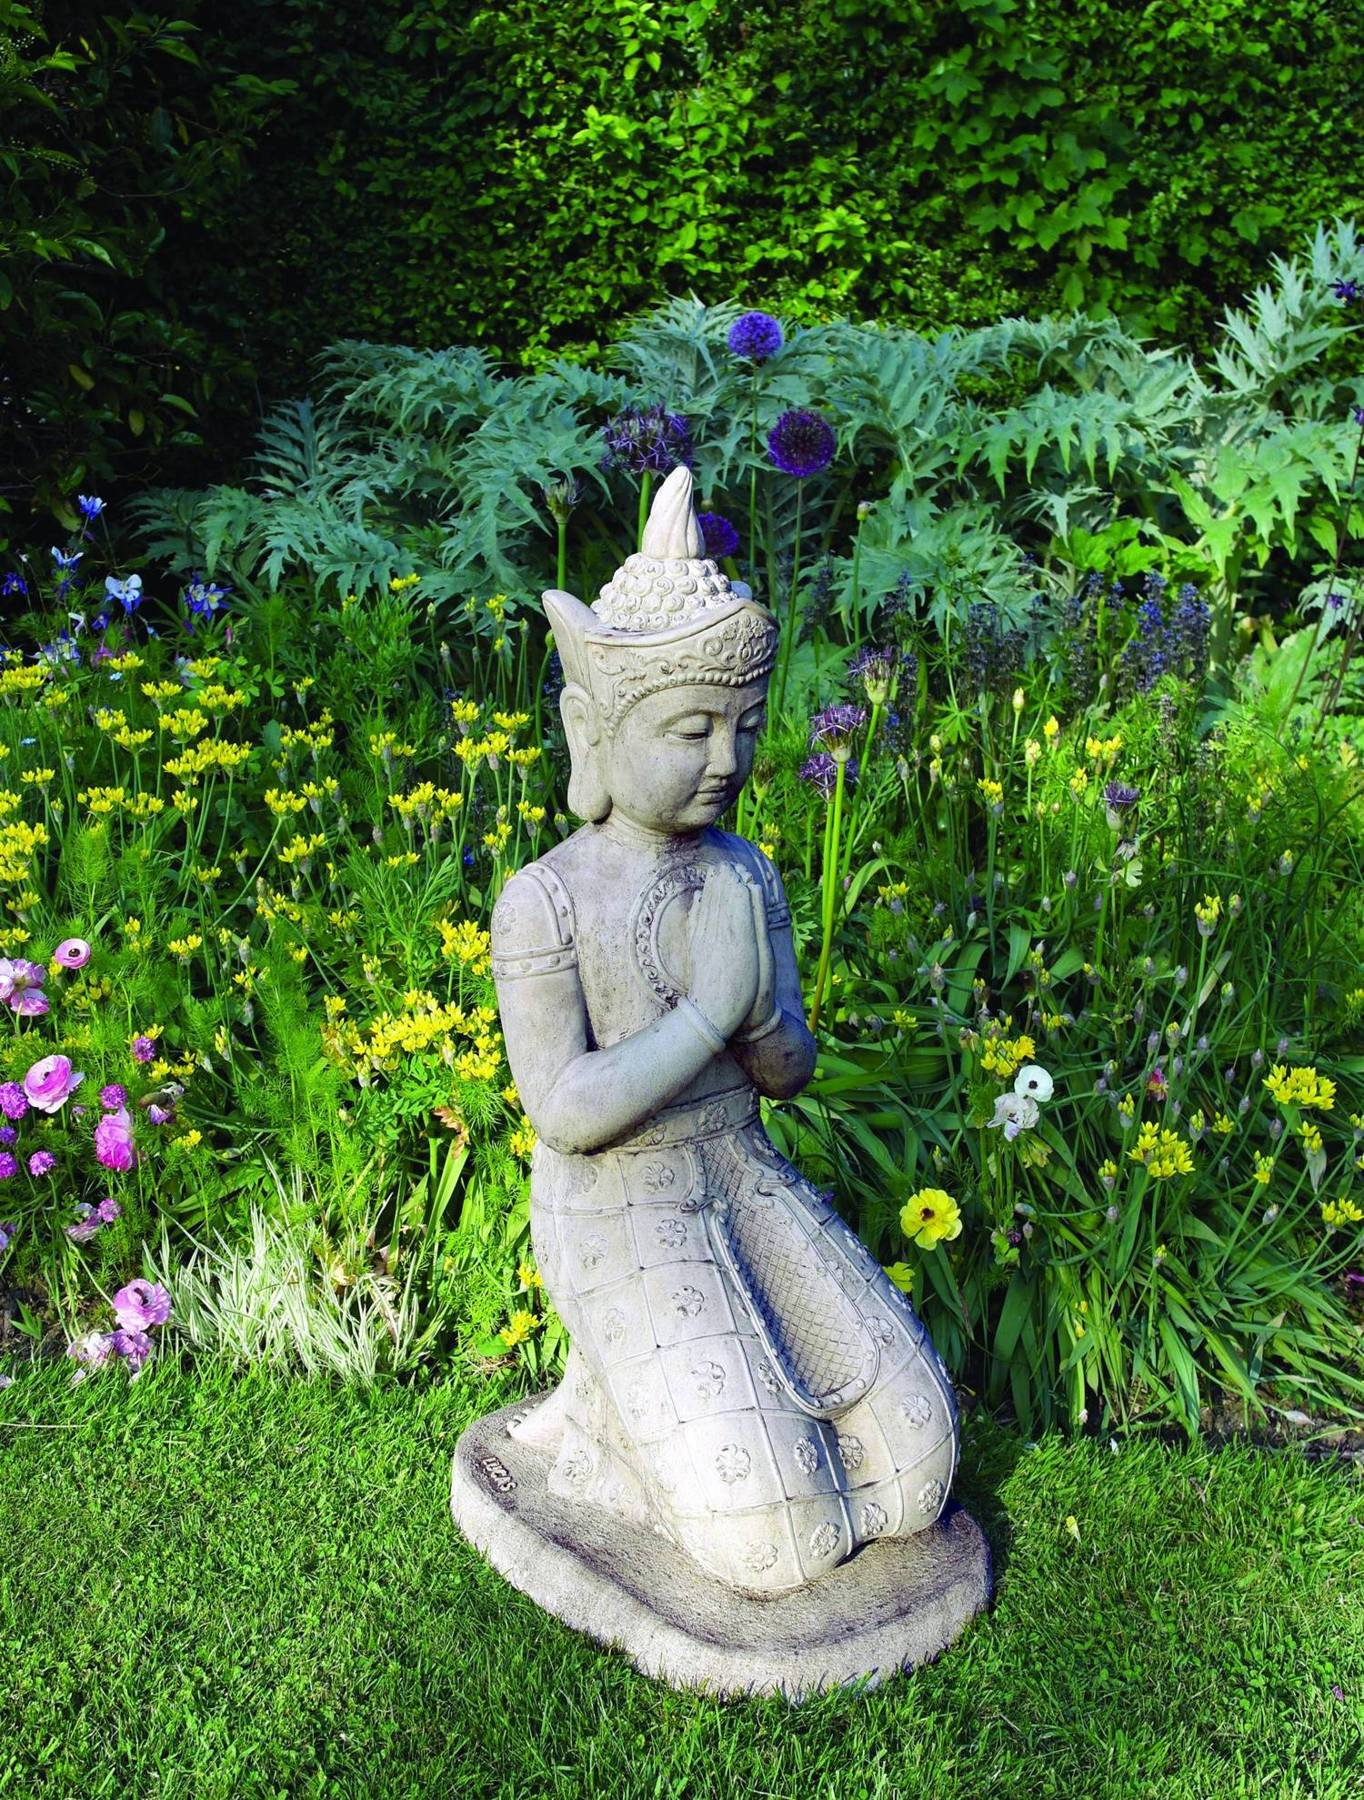 Kneeling Buddha Statue Garden Ornamnents